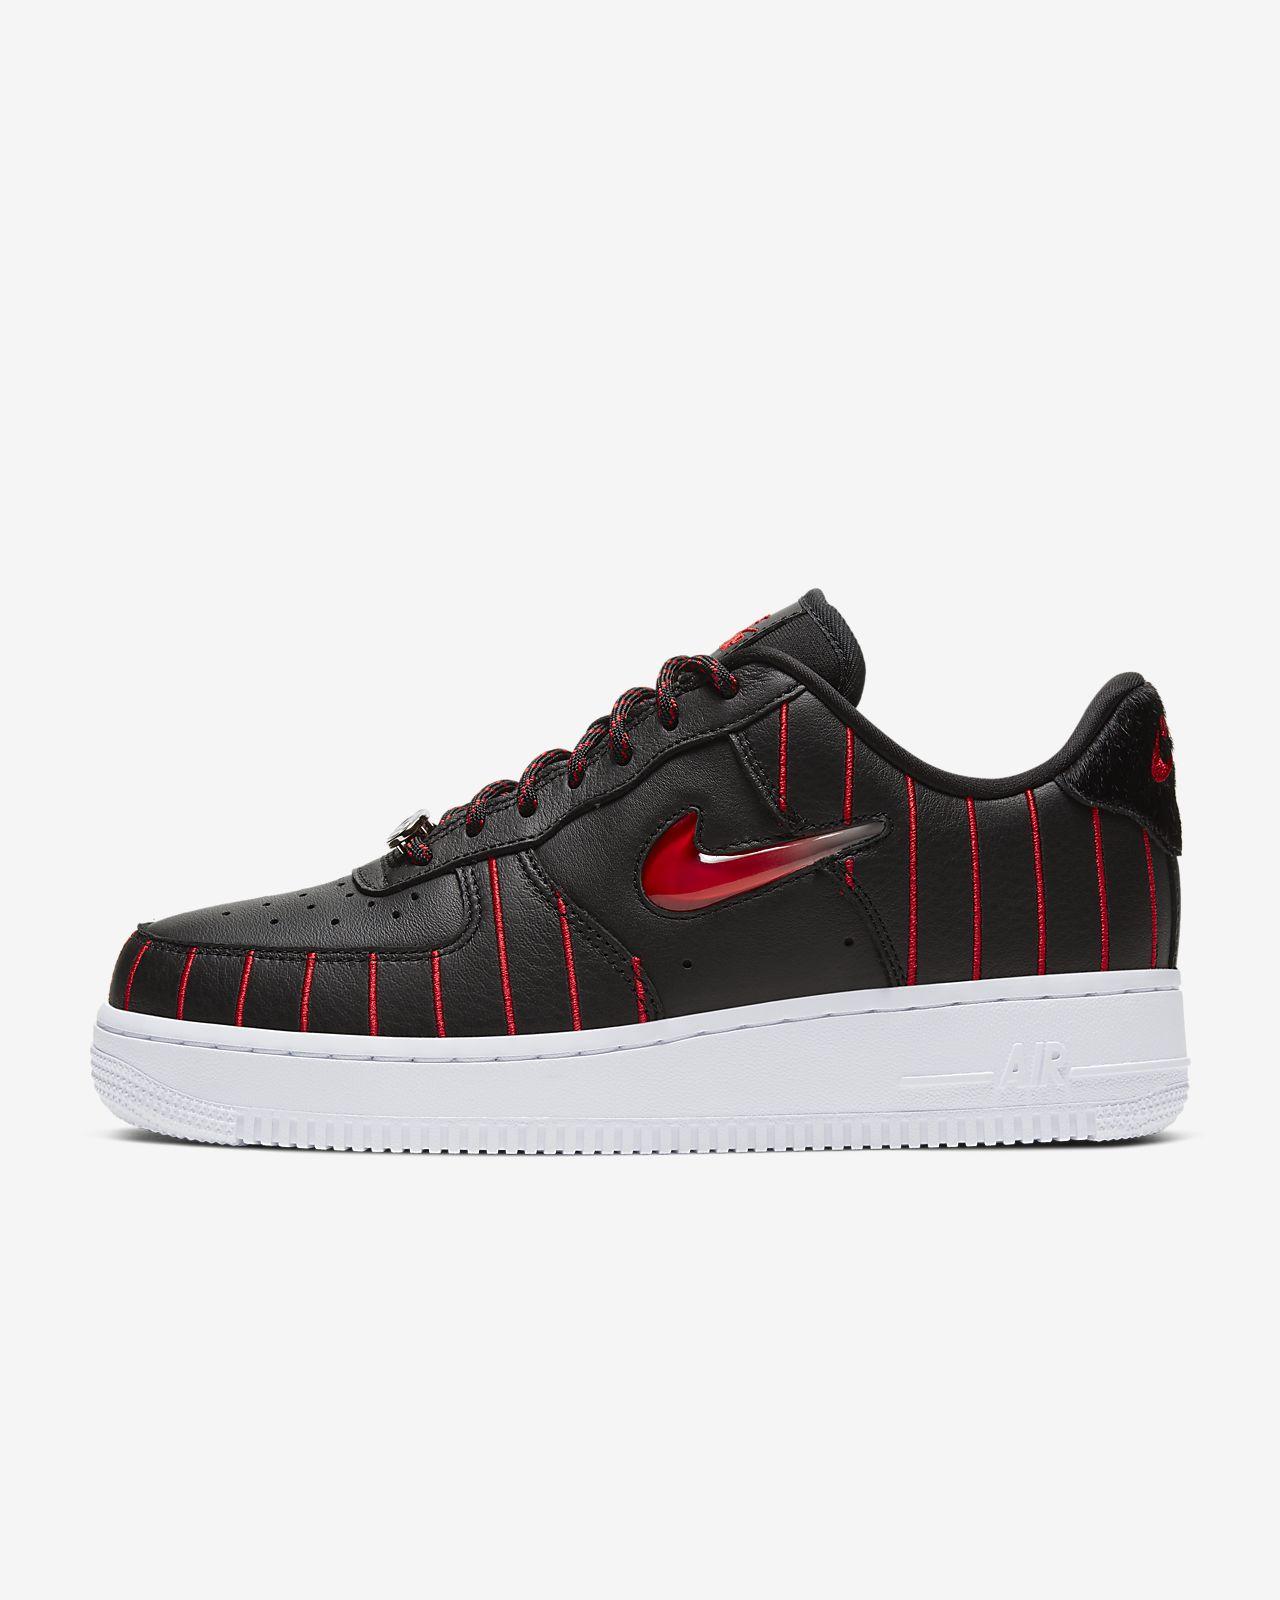 Nike Air Force 1 Jewel Women's Shoe